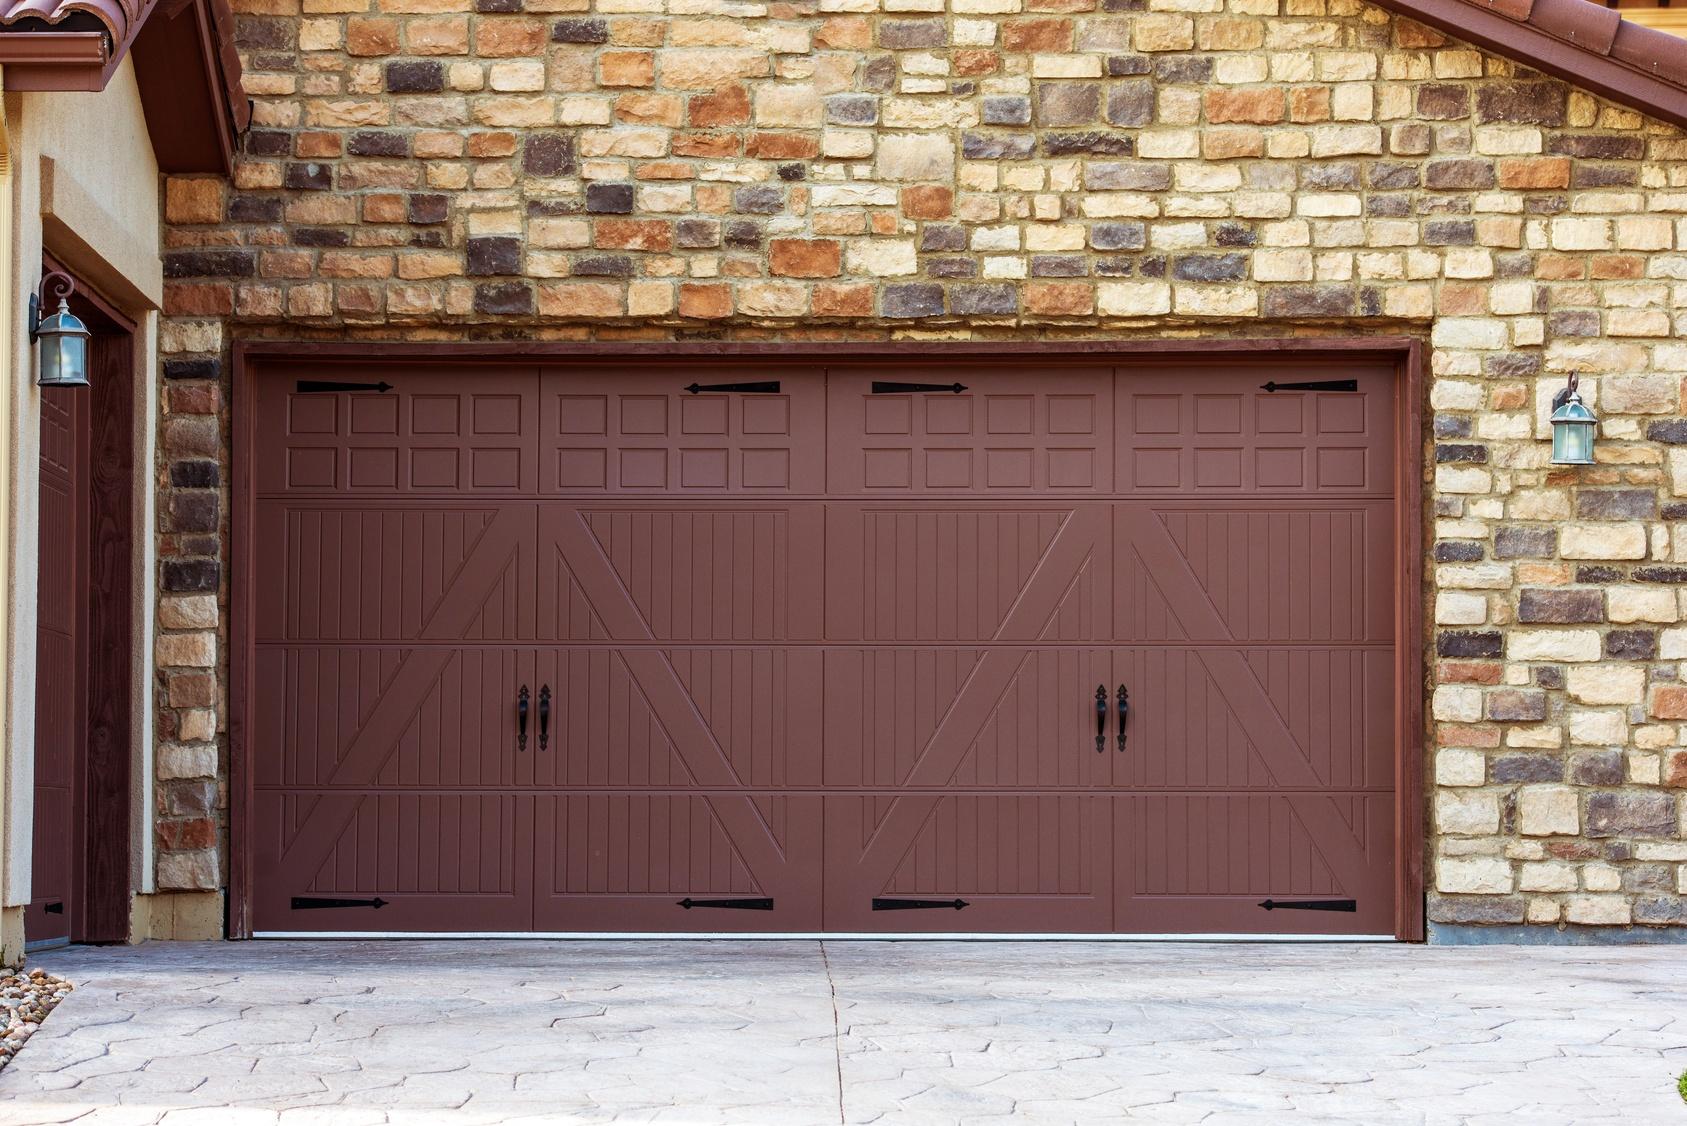 1126 #926139 Garage Door Repairs In Utah Blog A Plus Garage Doors wallpaper Utah Garage Doors 36851687